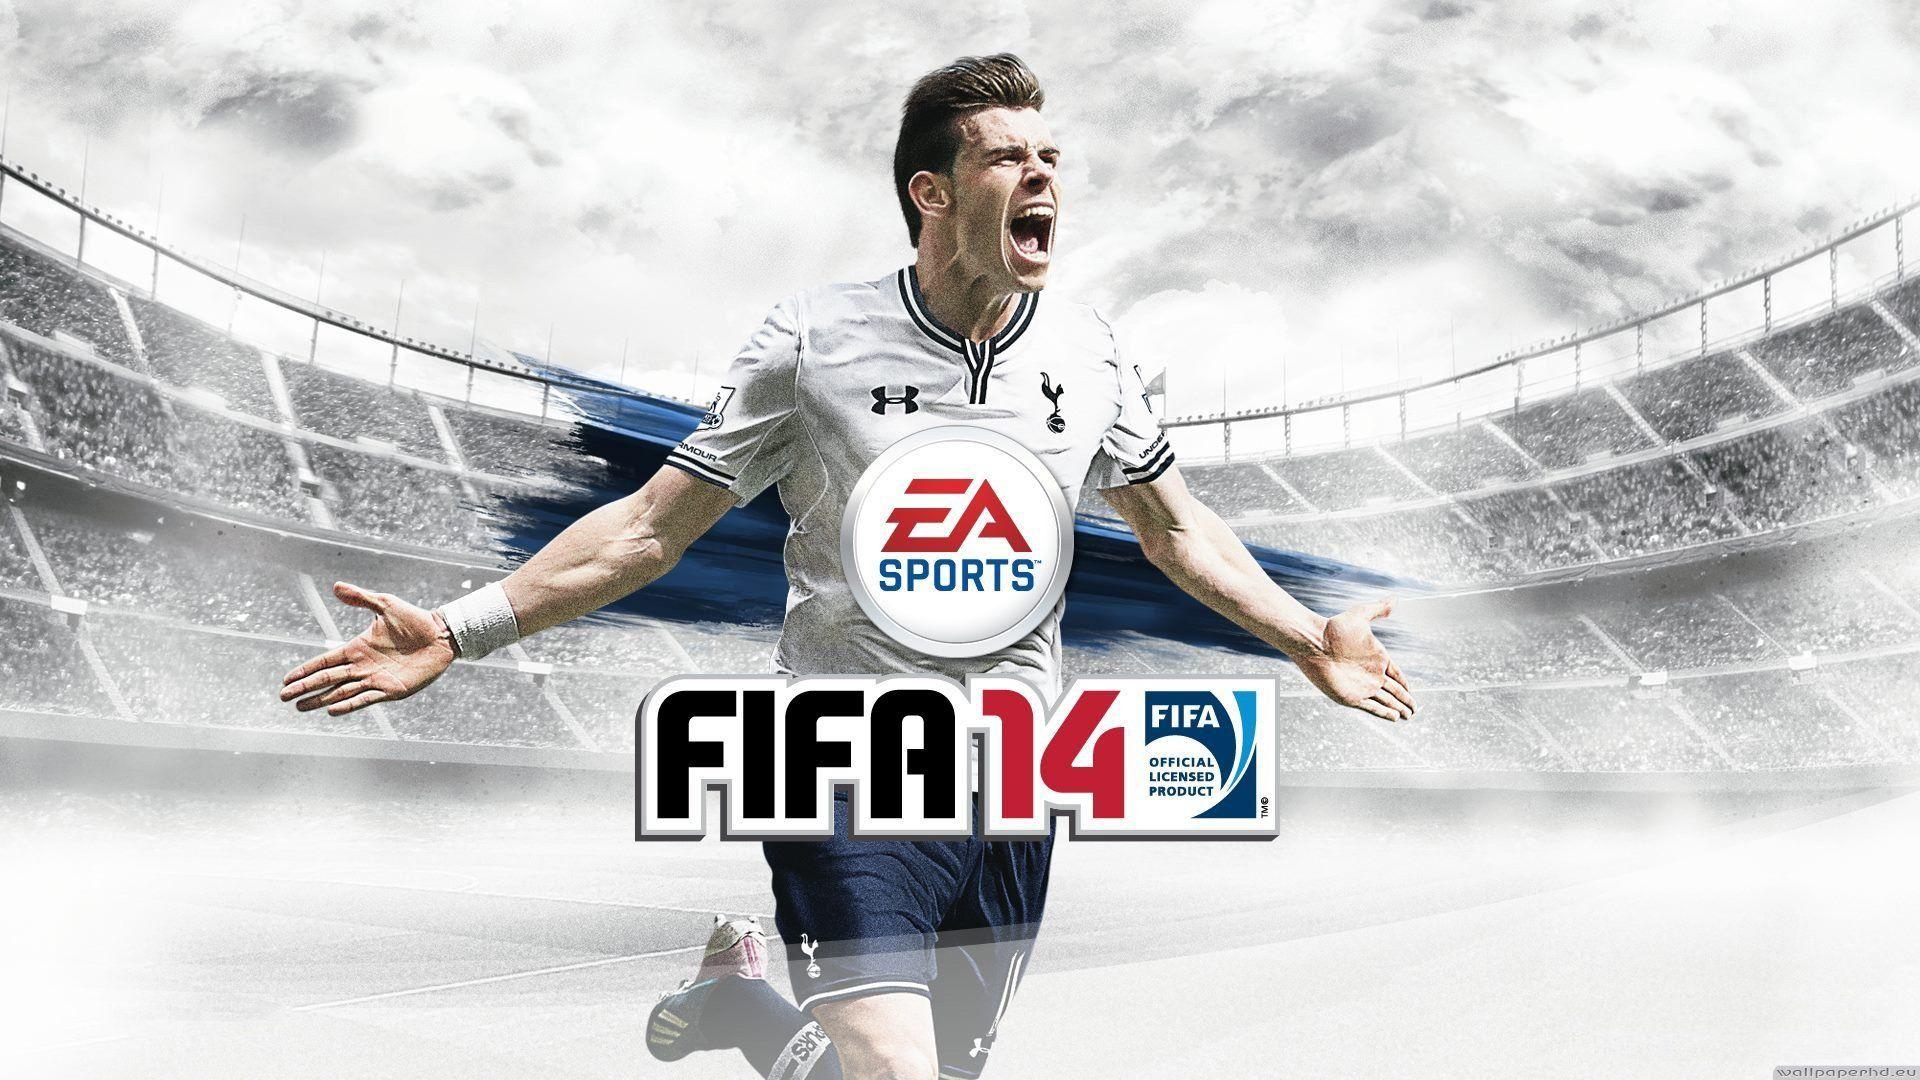 FIFA 14 Free Download AllGames4ME © 2014 Fifa, Game